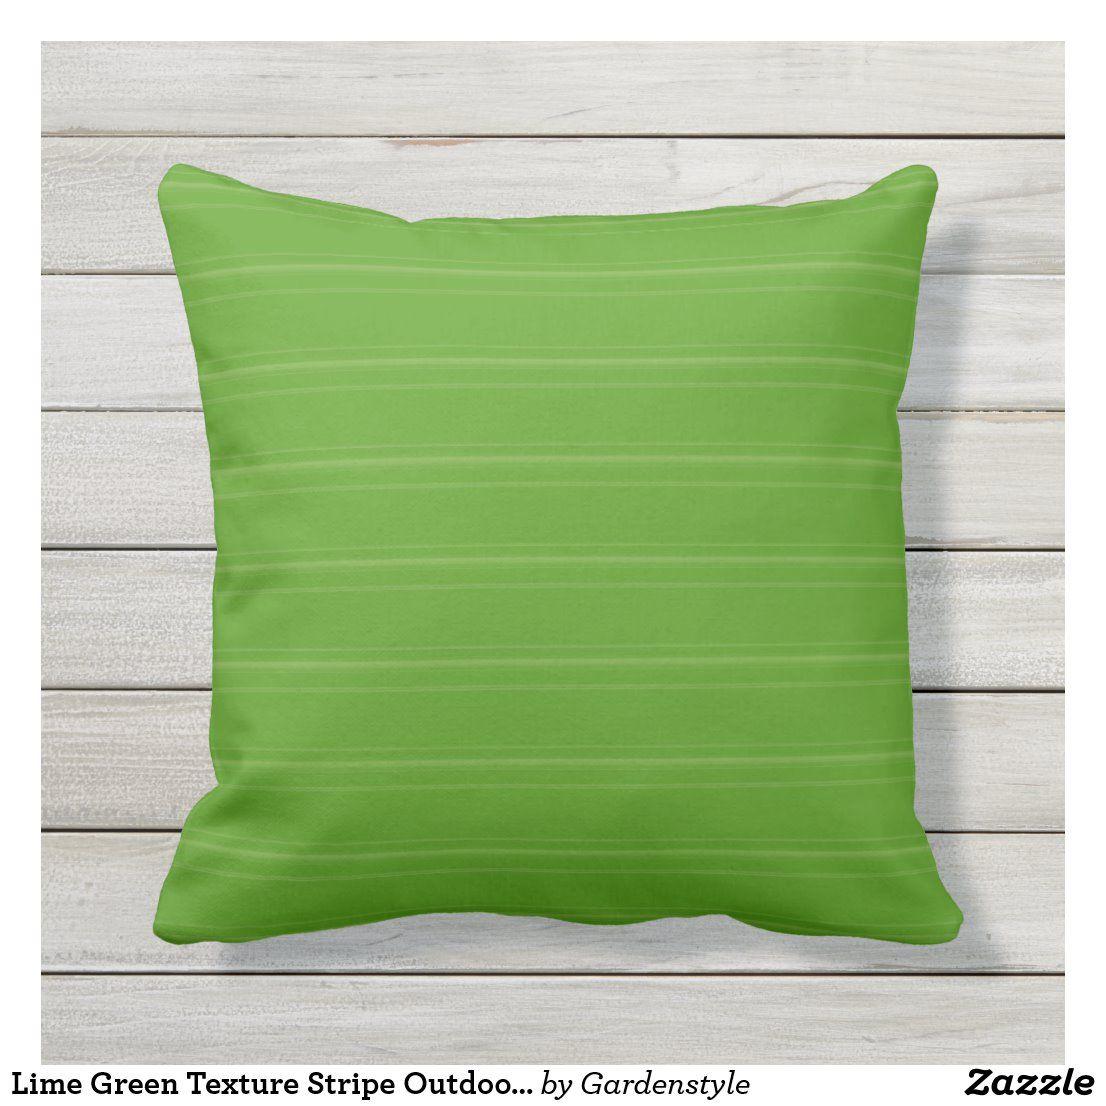 Lime Green Texture Stripe Outdoor Pillow 16x16 Zazzle Com Outdoor Pillows Striped Outdoor Pillow Green Texture